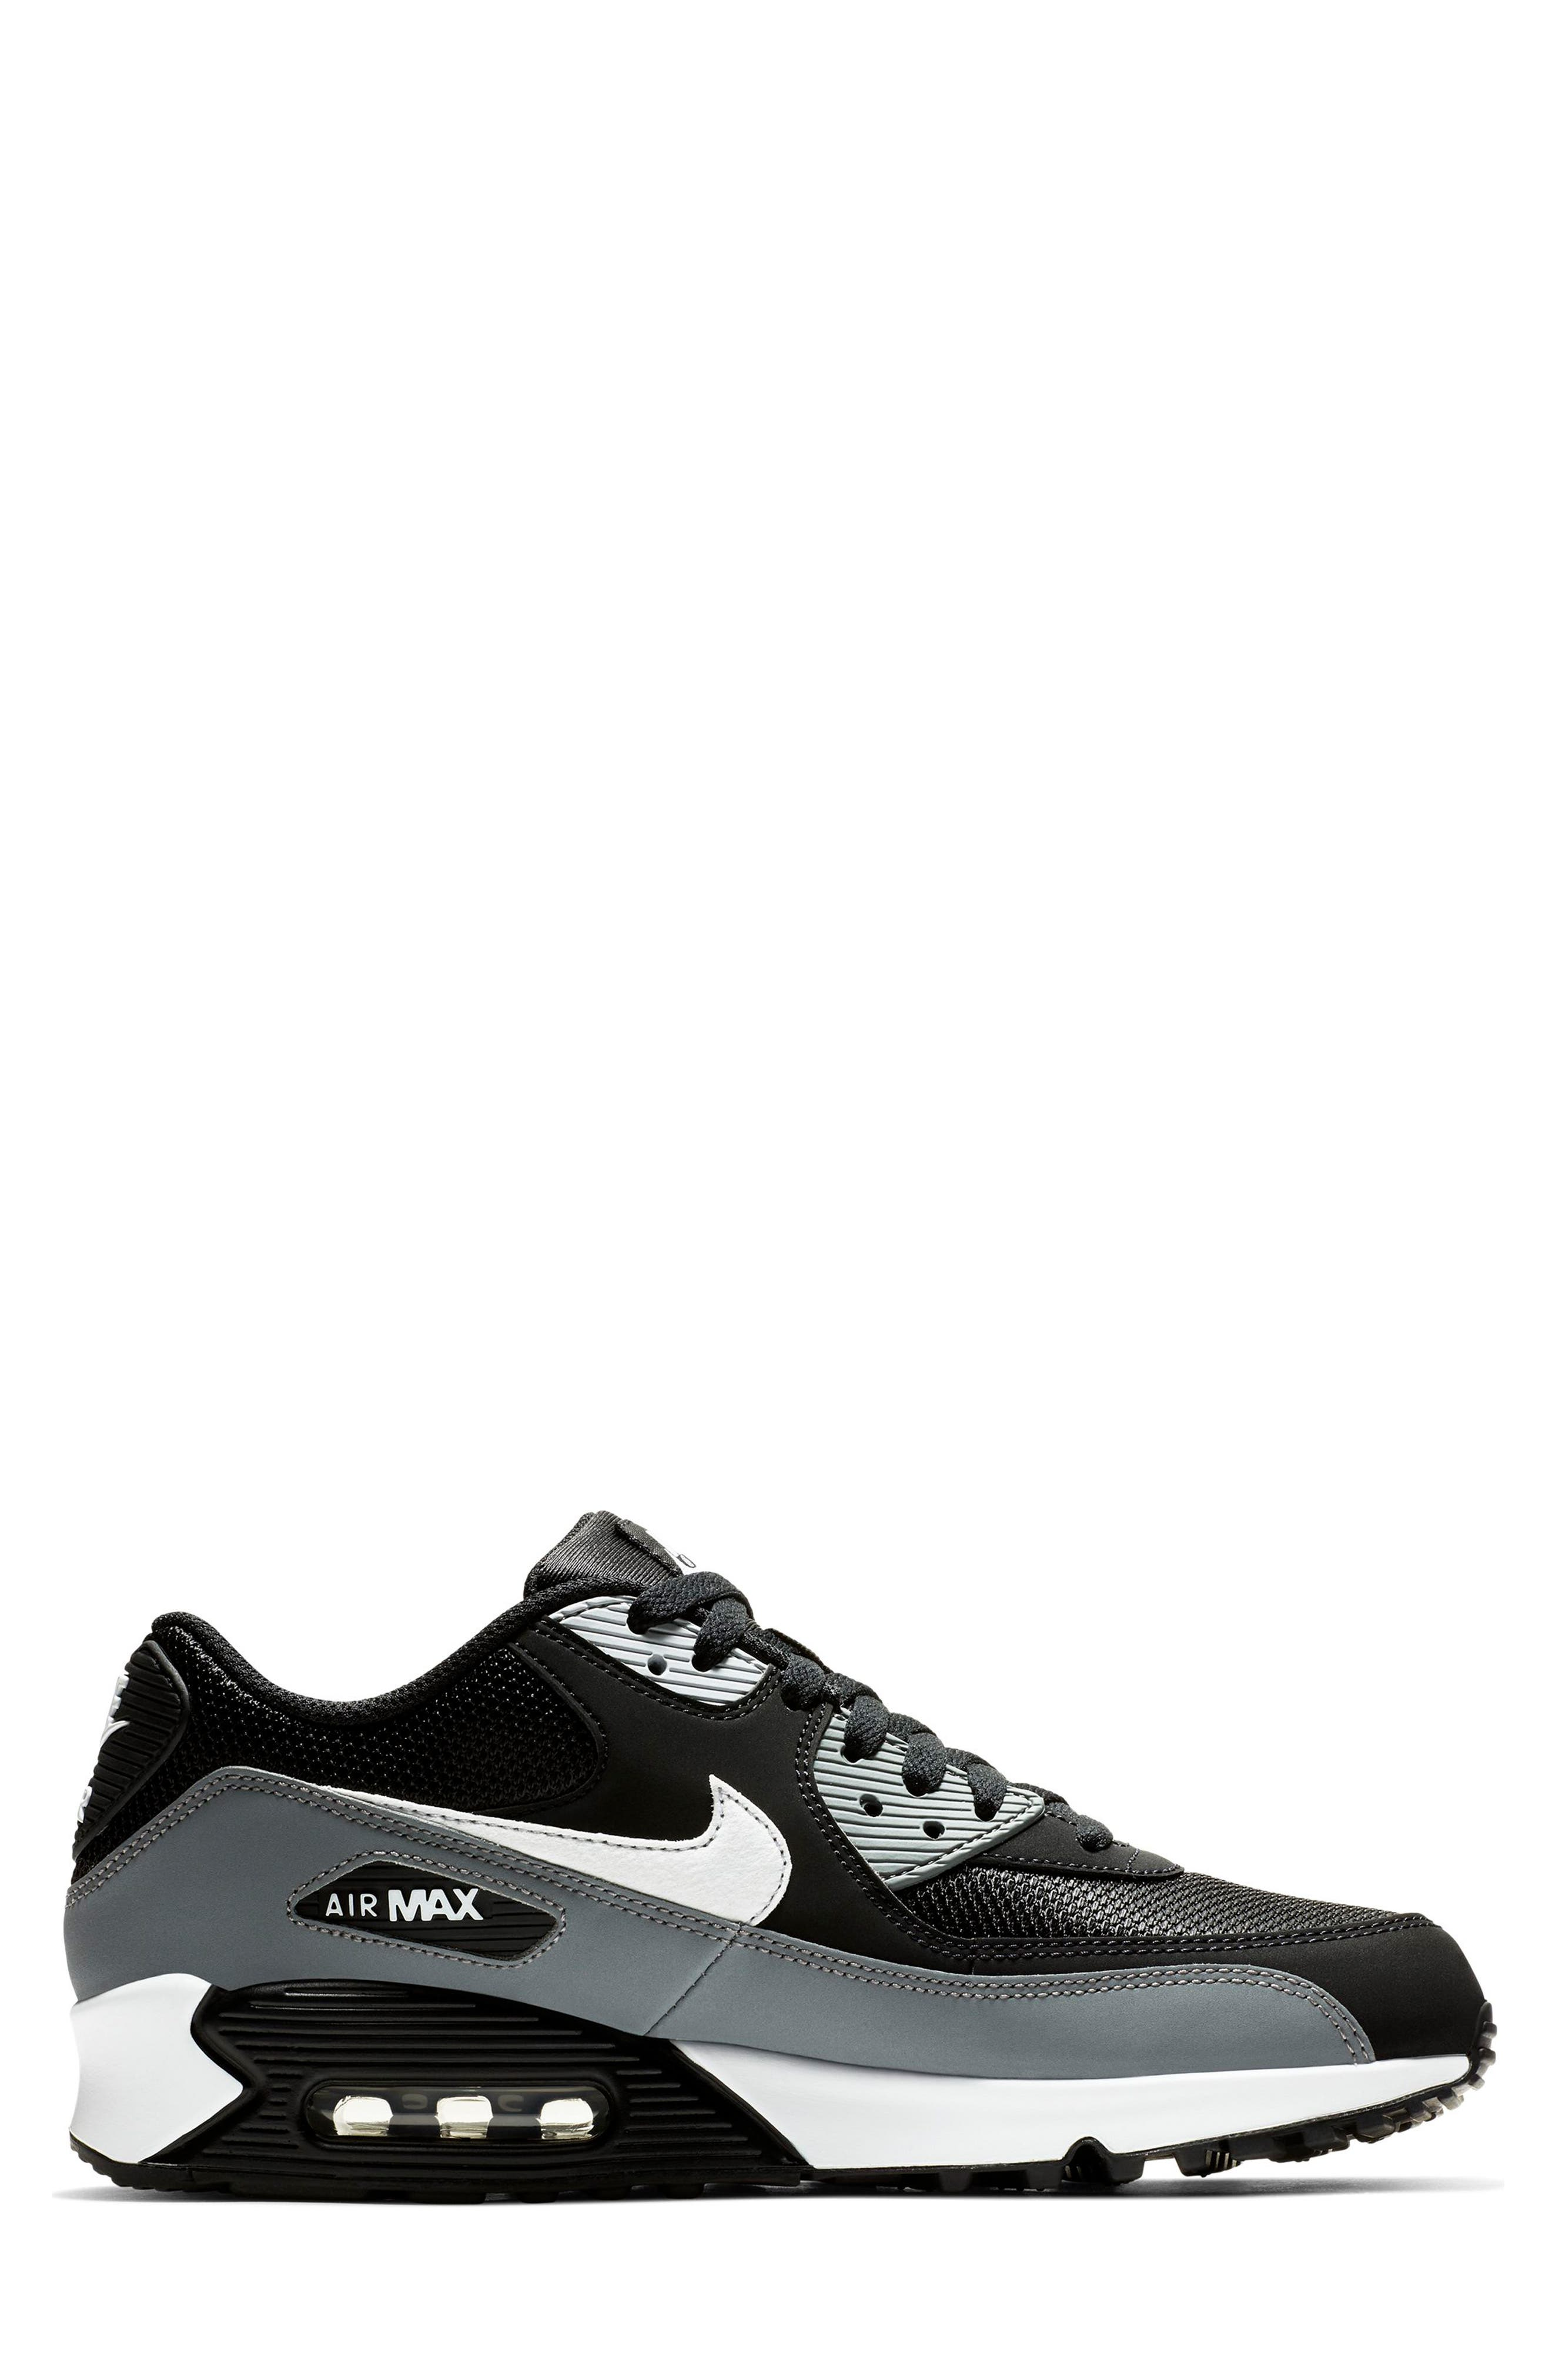 Air Max 90 Essential Sneaker,                             Alternate thumbnail 2, color,                             BLACK/ WHITE/ COOL GREY